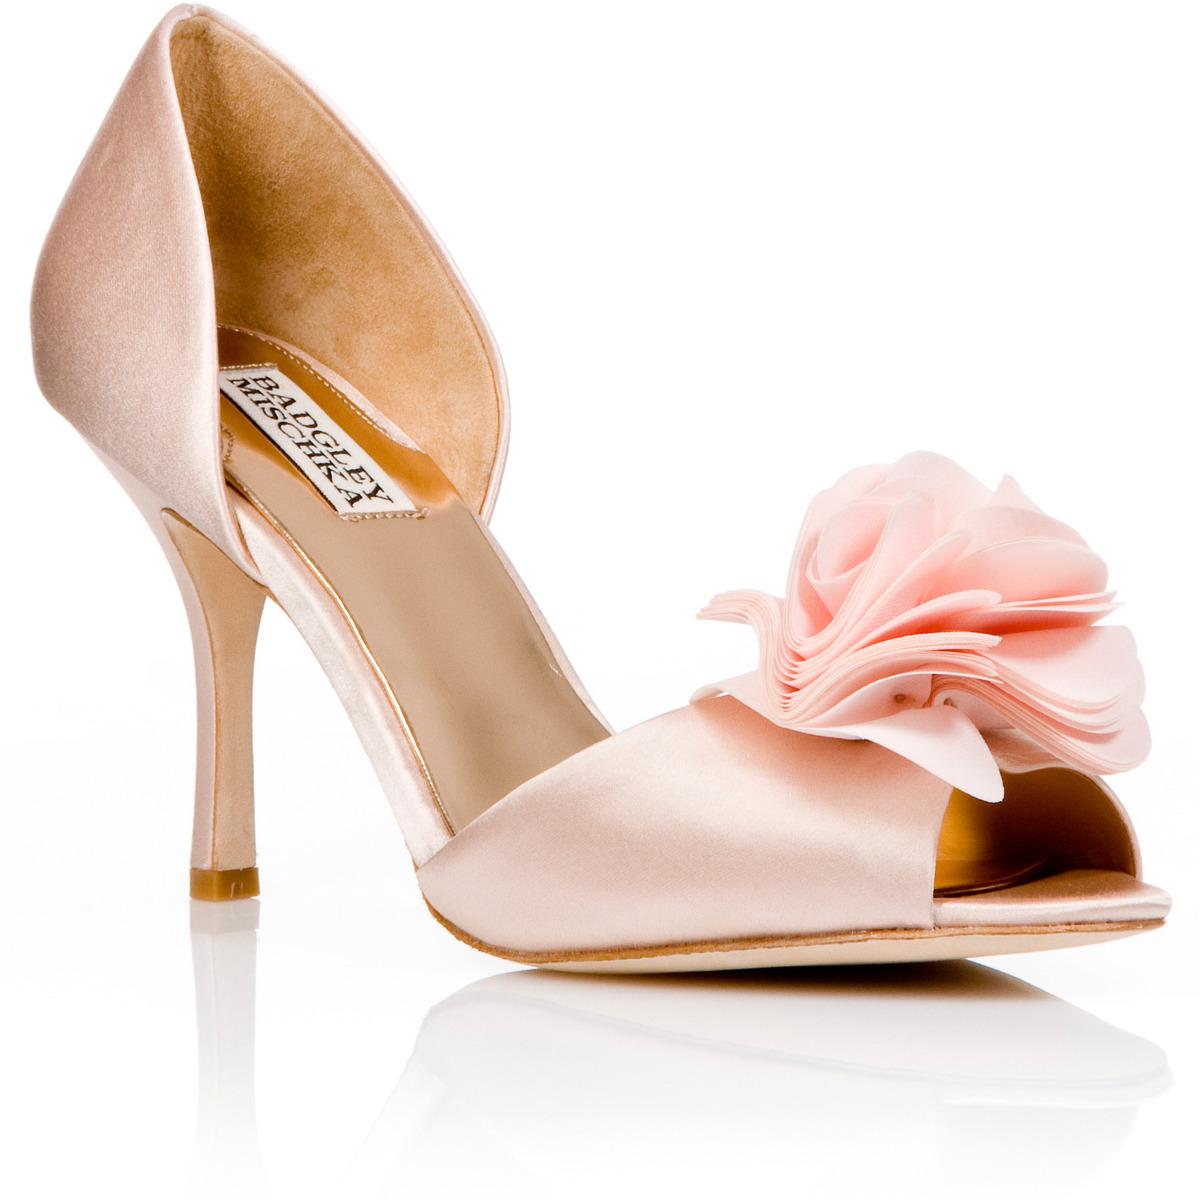 9cacd3a4b8e Nak_Bridal_Evening_νυφικά_παπούτσια (1) Nak_Bridal_Evening_νυφικά_παπούτσια  ...